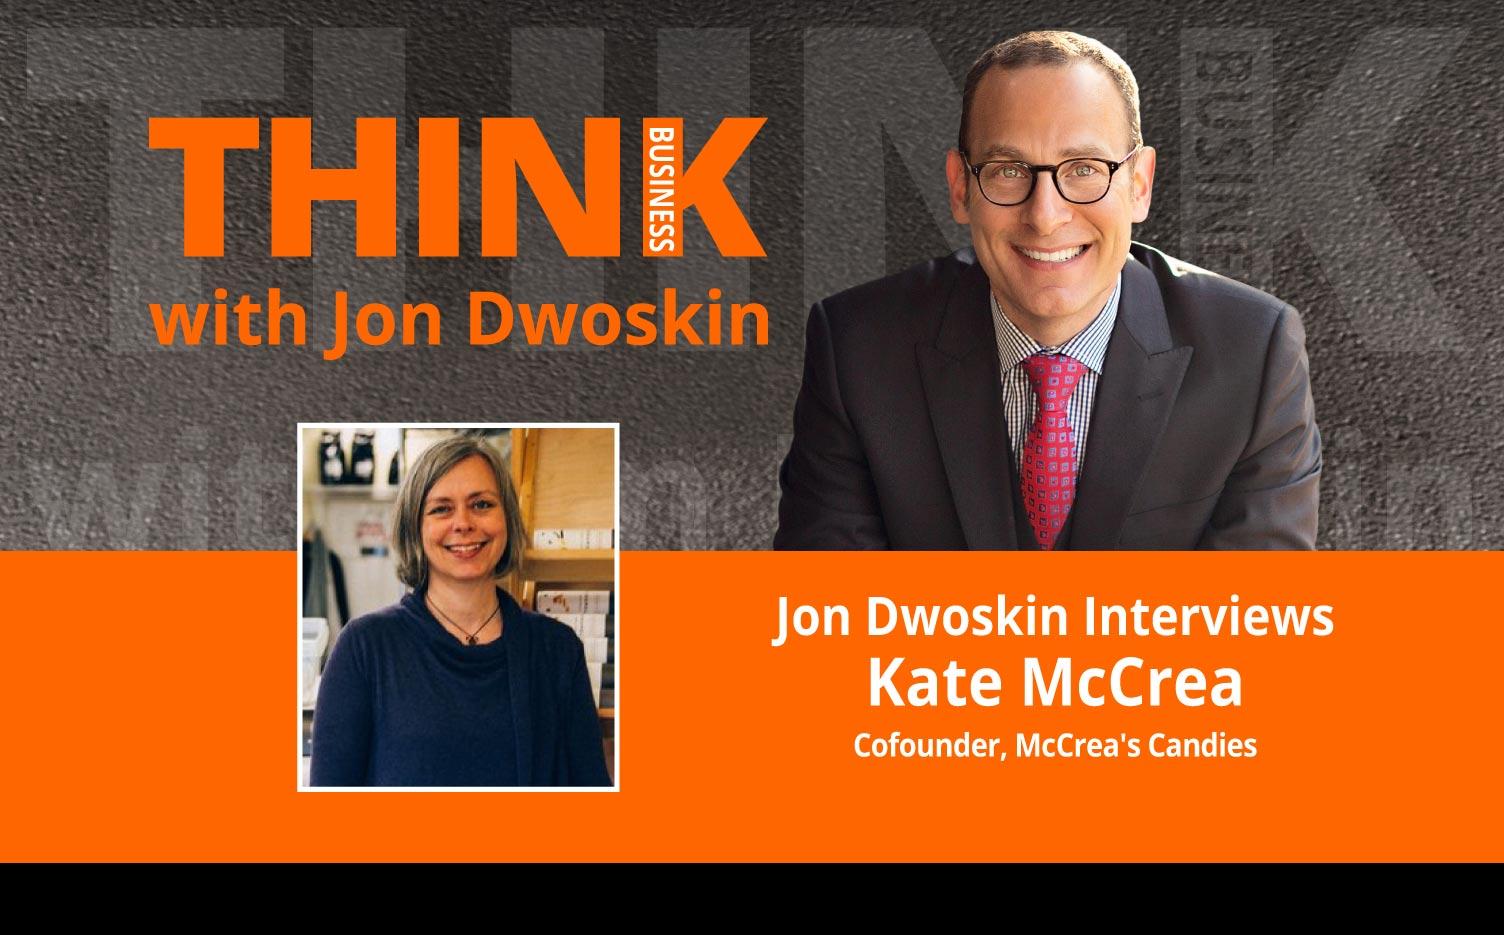 THINK Business Podcast: Jon Dwoskin Interviews Kate McCrea, Cofounder, McCrea's Candies